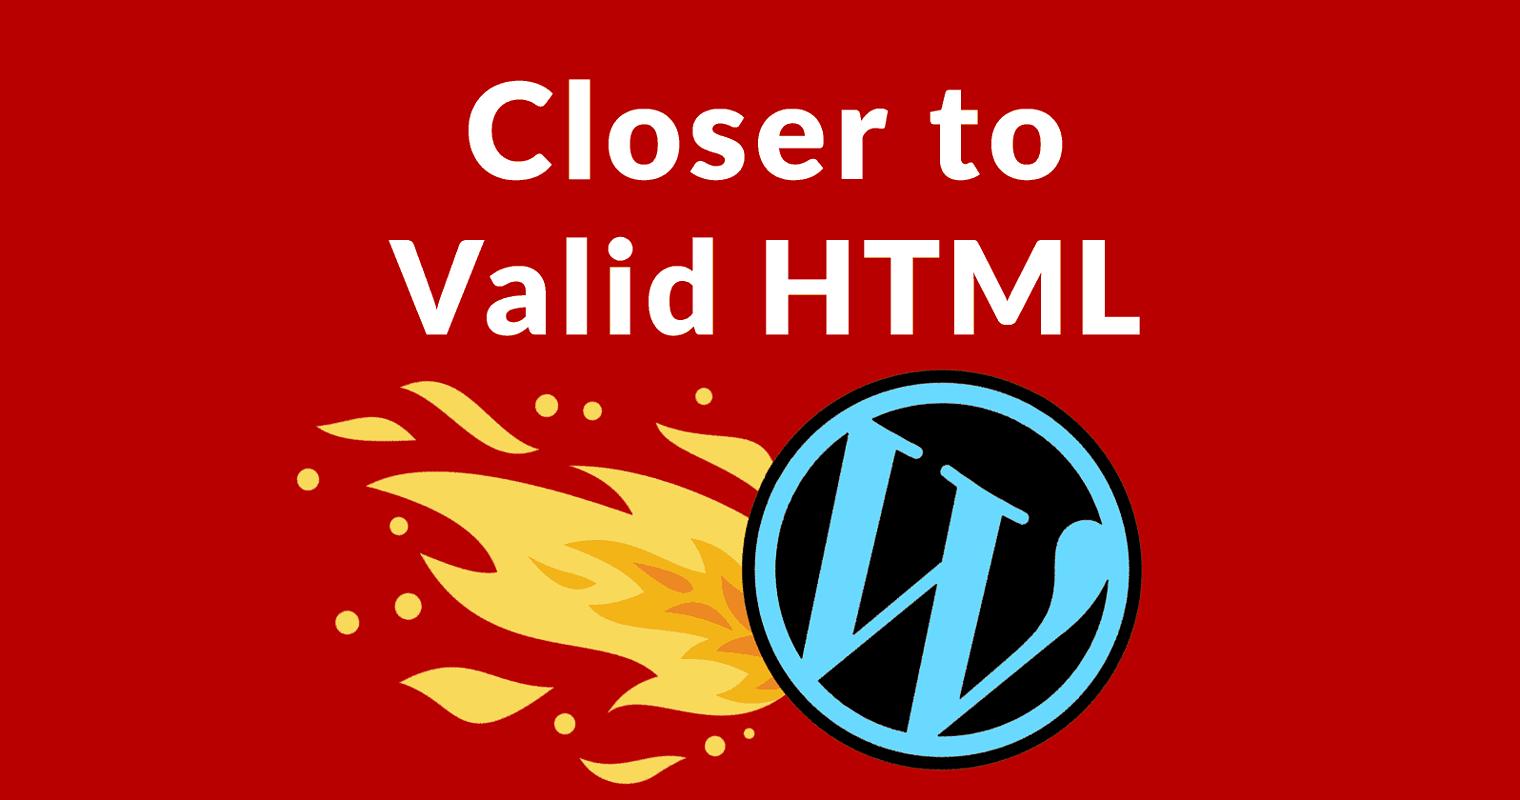 WordPress 5.3 Moves Closer to Valid HTML